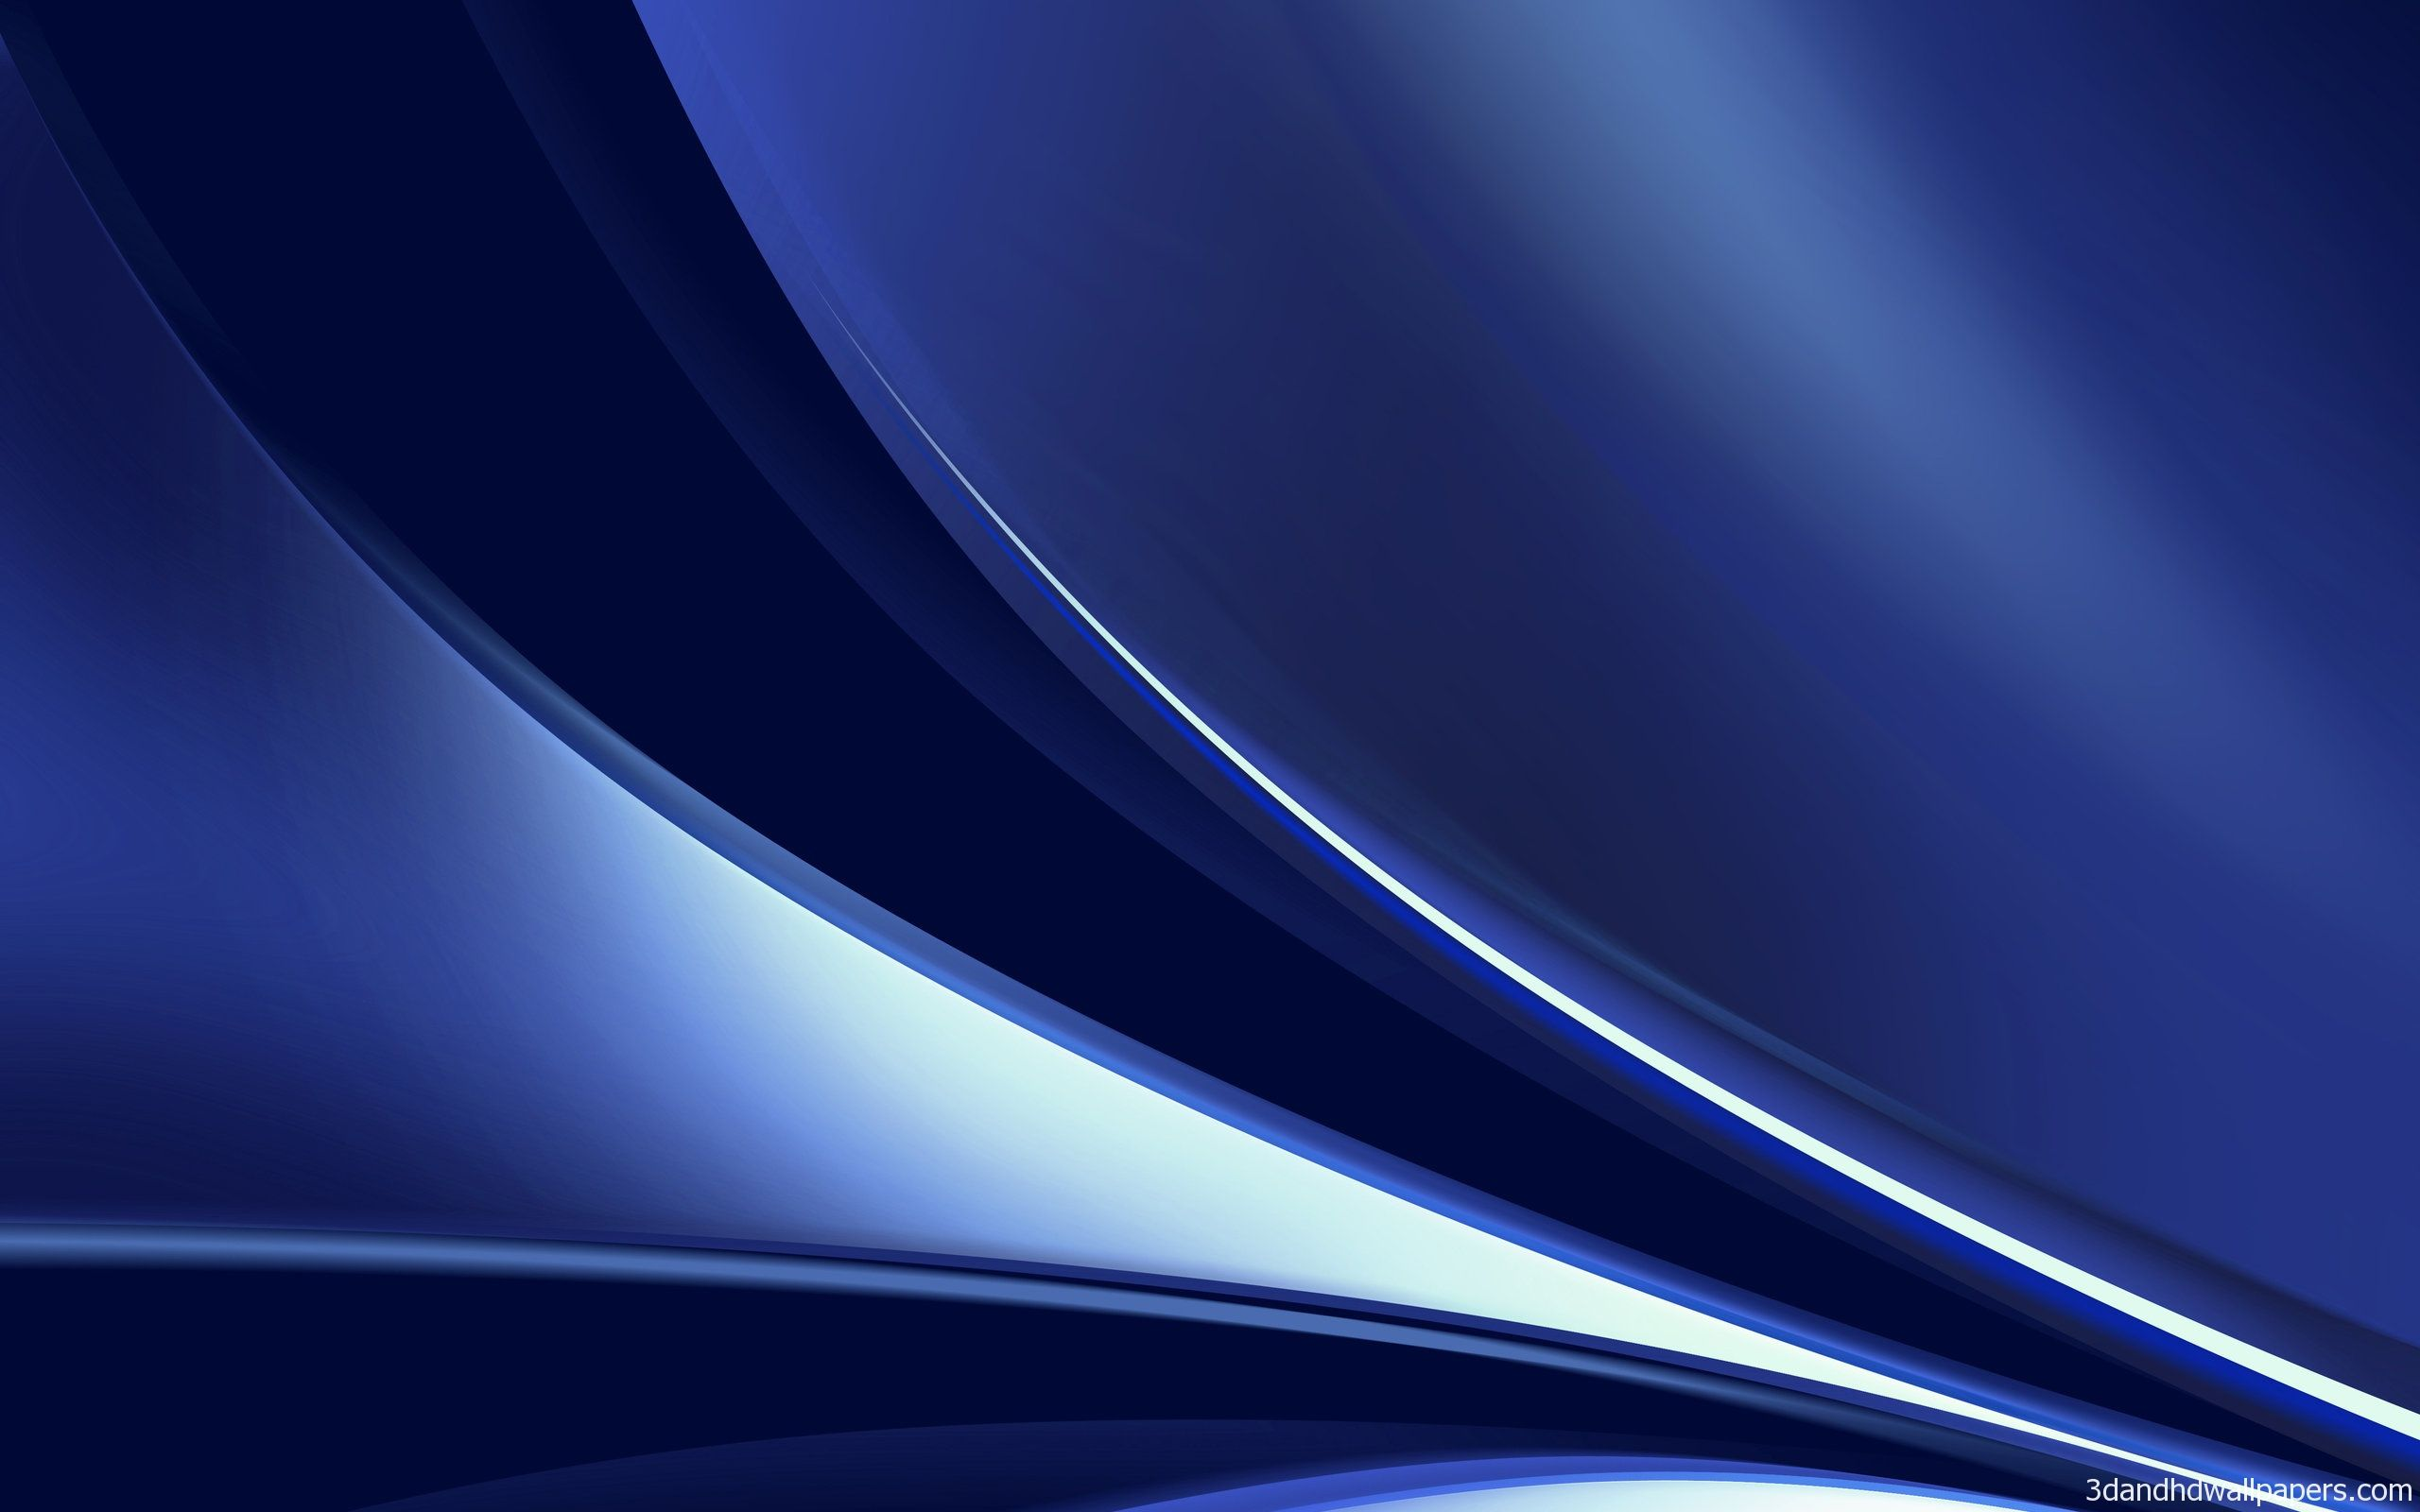 Shadow hd colour shadow white colour blue white background blue black